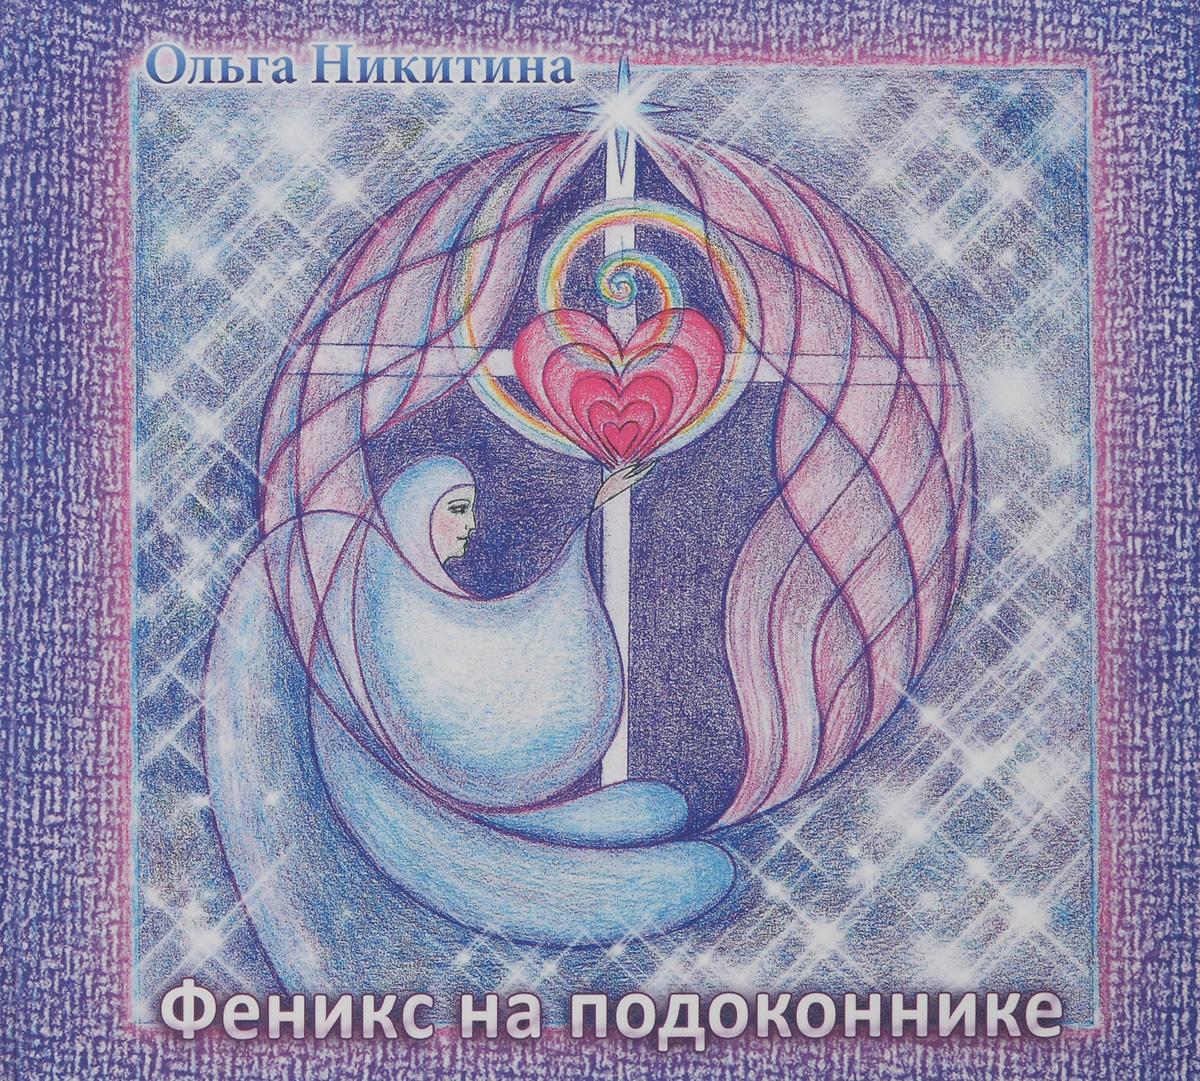 Ольга Никитина Ольга Никитина. Феникс на подоконнике